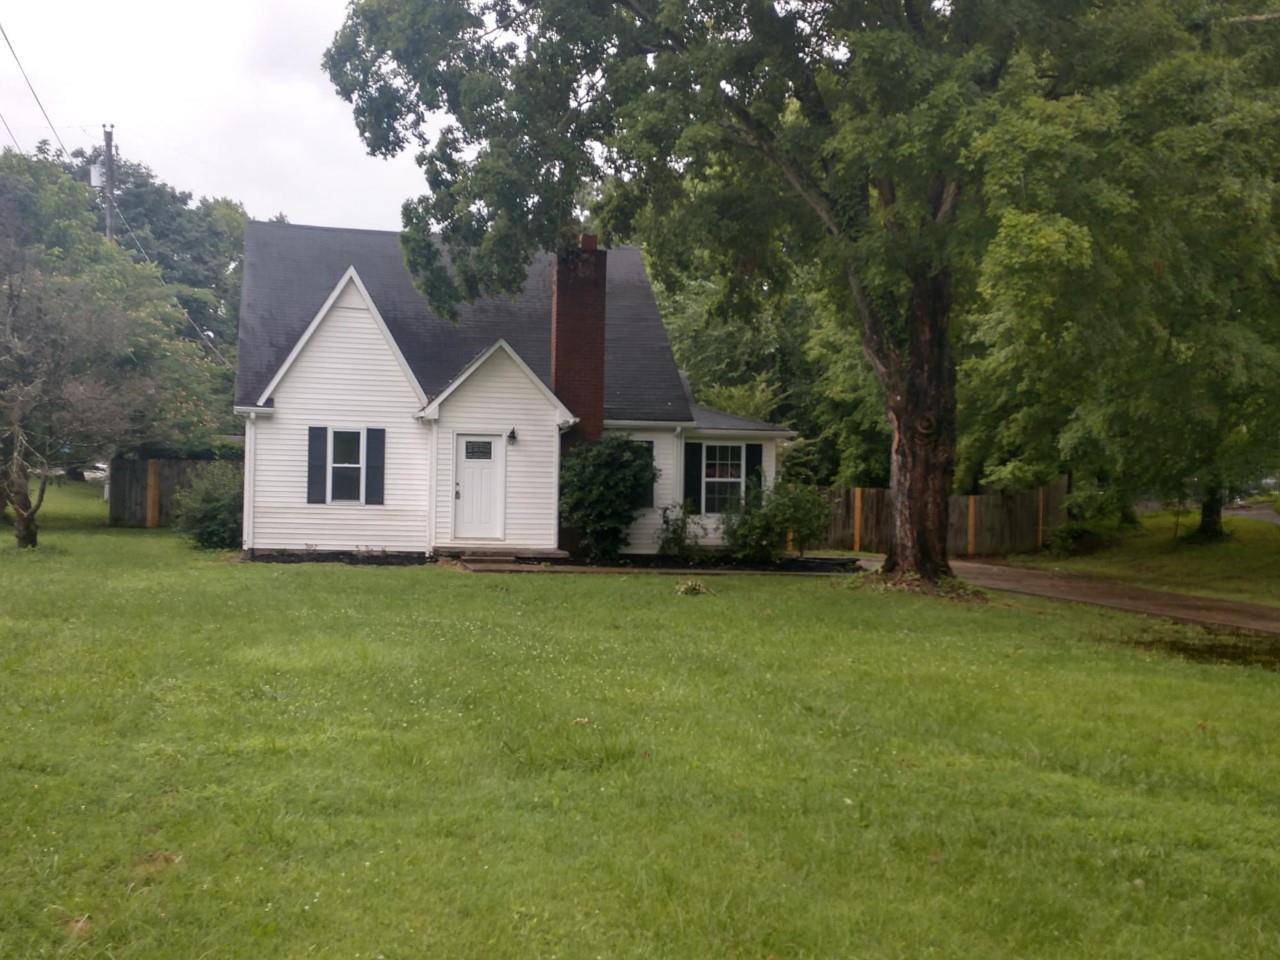 2270 Old Ashland City Rd, Clarksville, TN 37043 - Clarksville, TN real estate listing